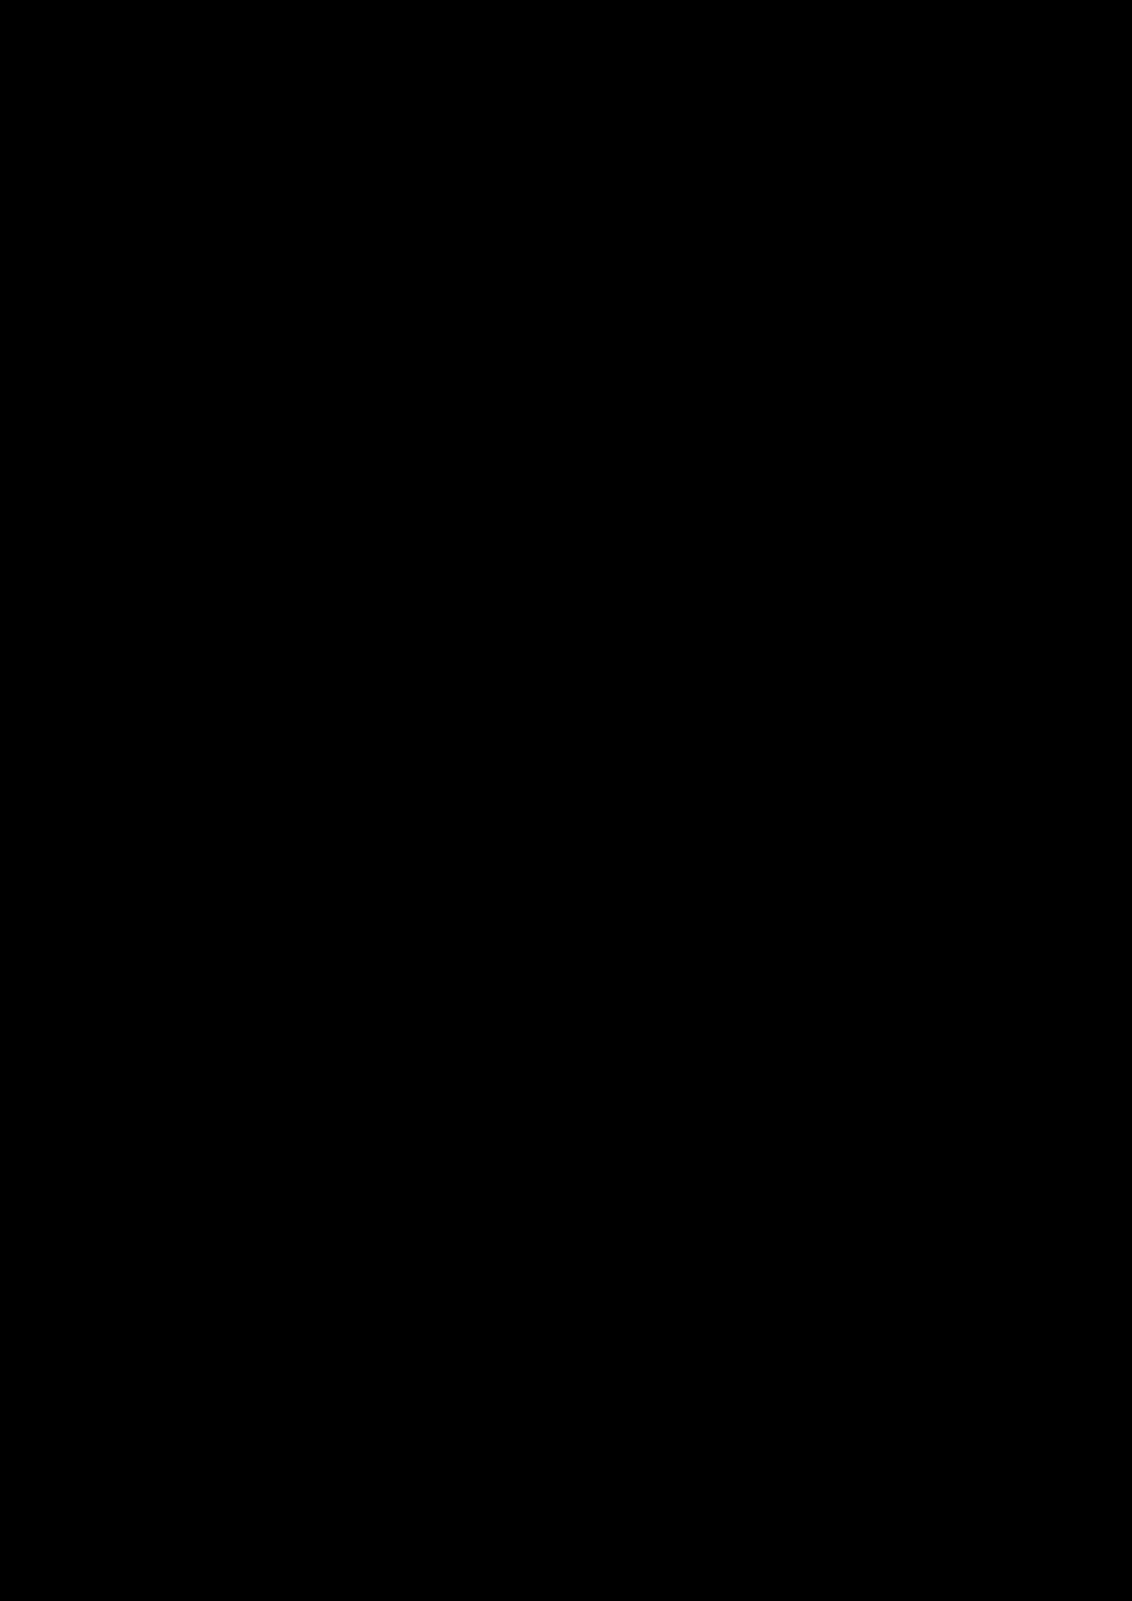 Belyiy sokol slide, Image 199